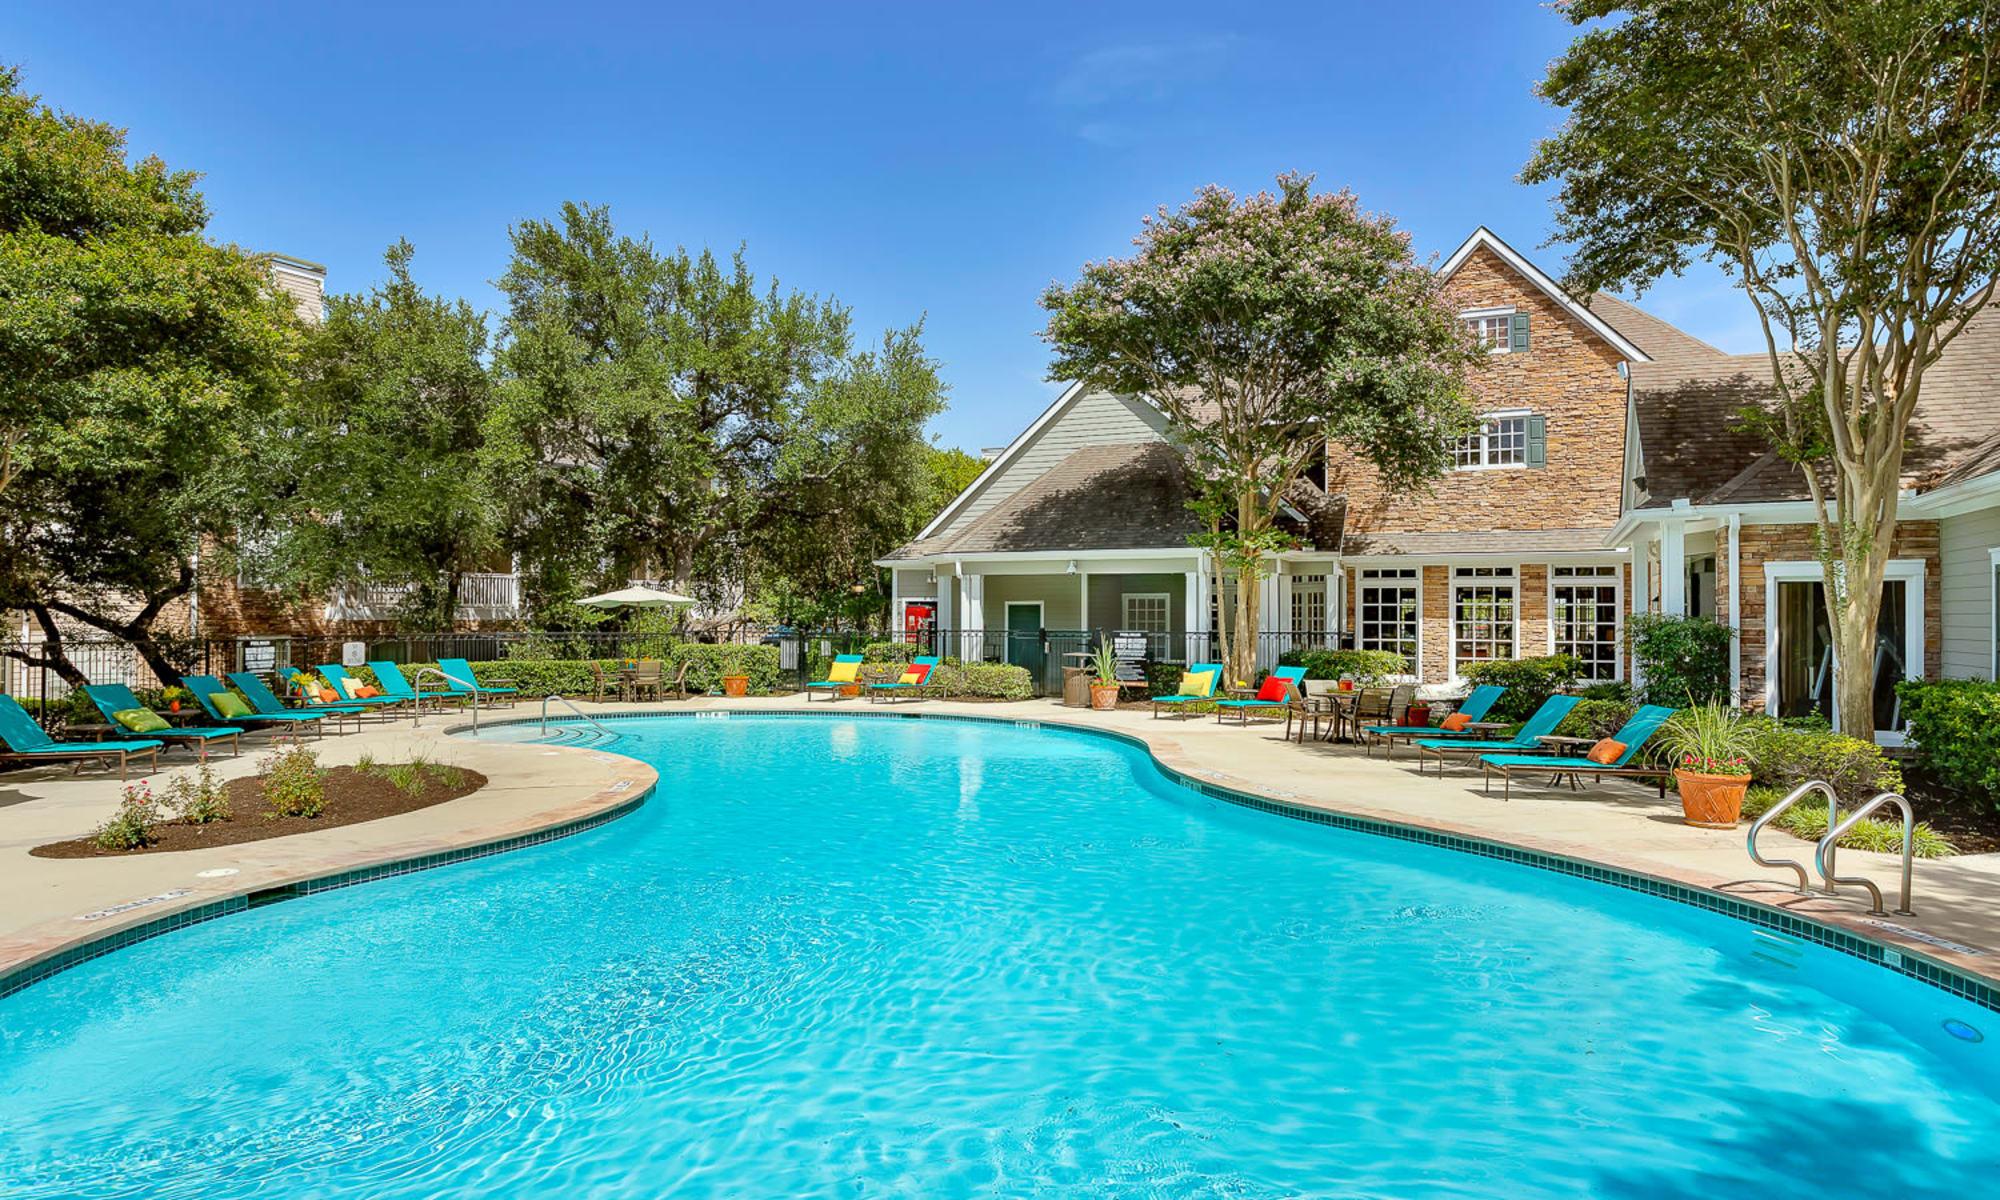 Apartments at The Lodge at Westover Hills in San Antonio, Texas